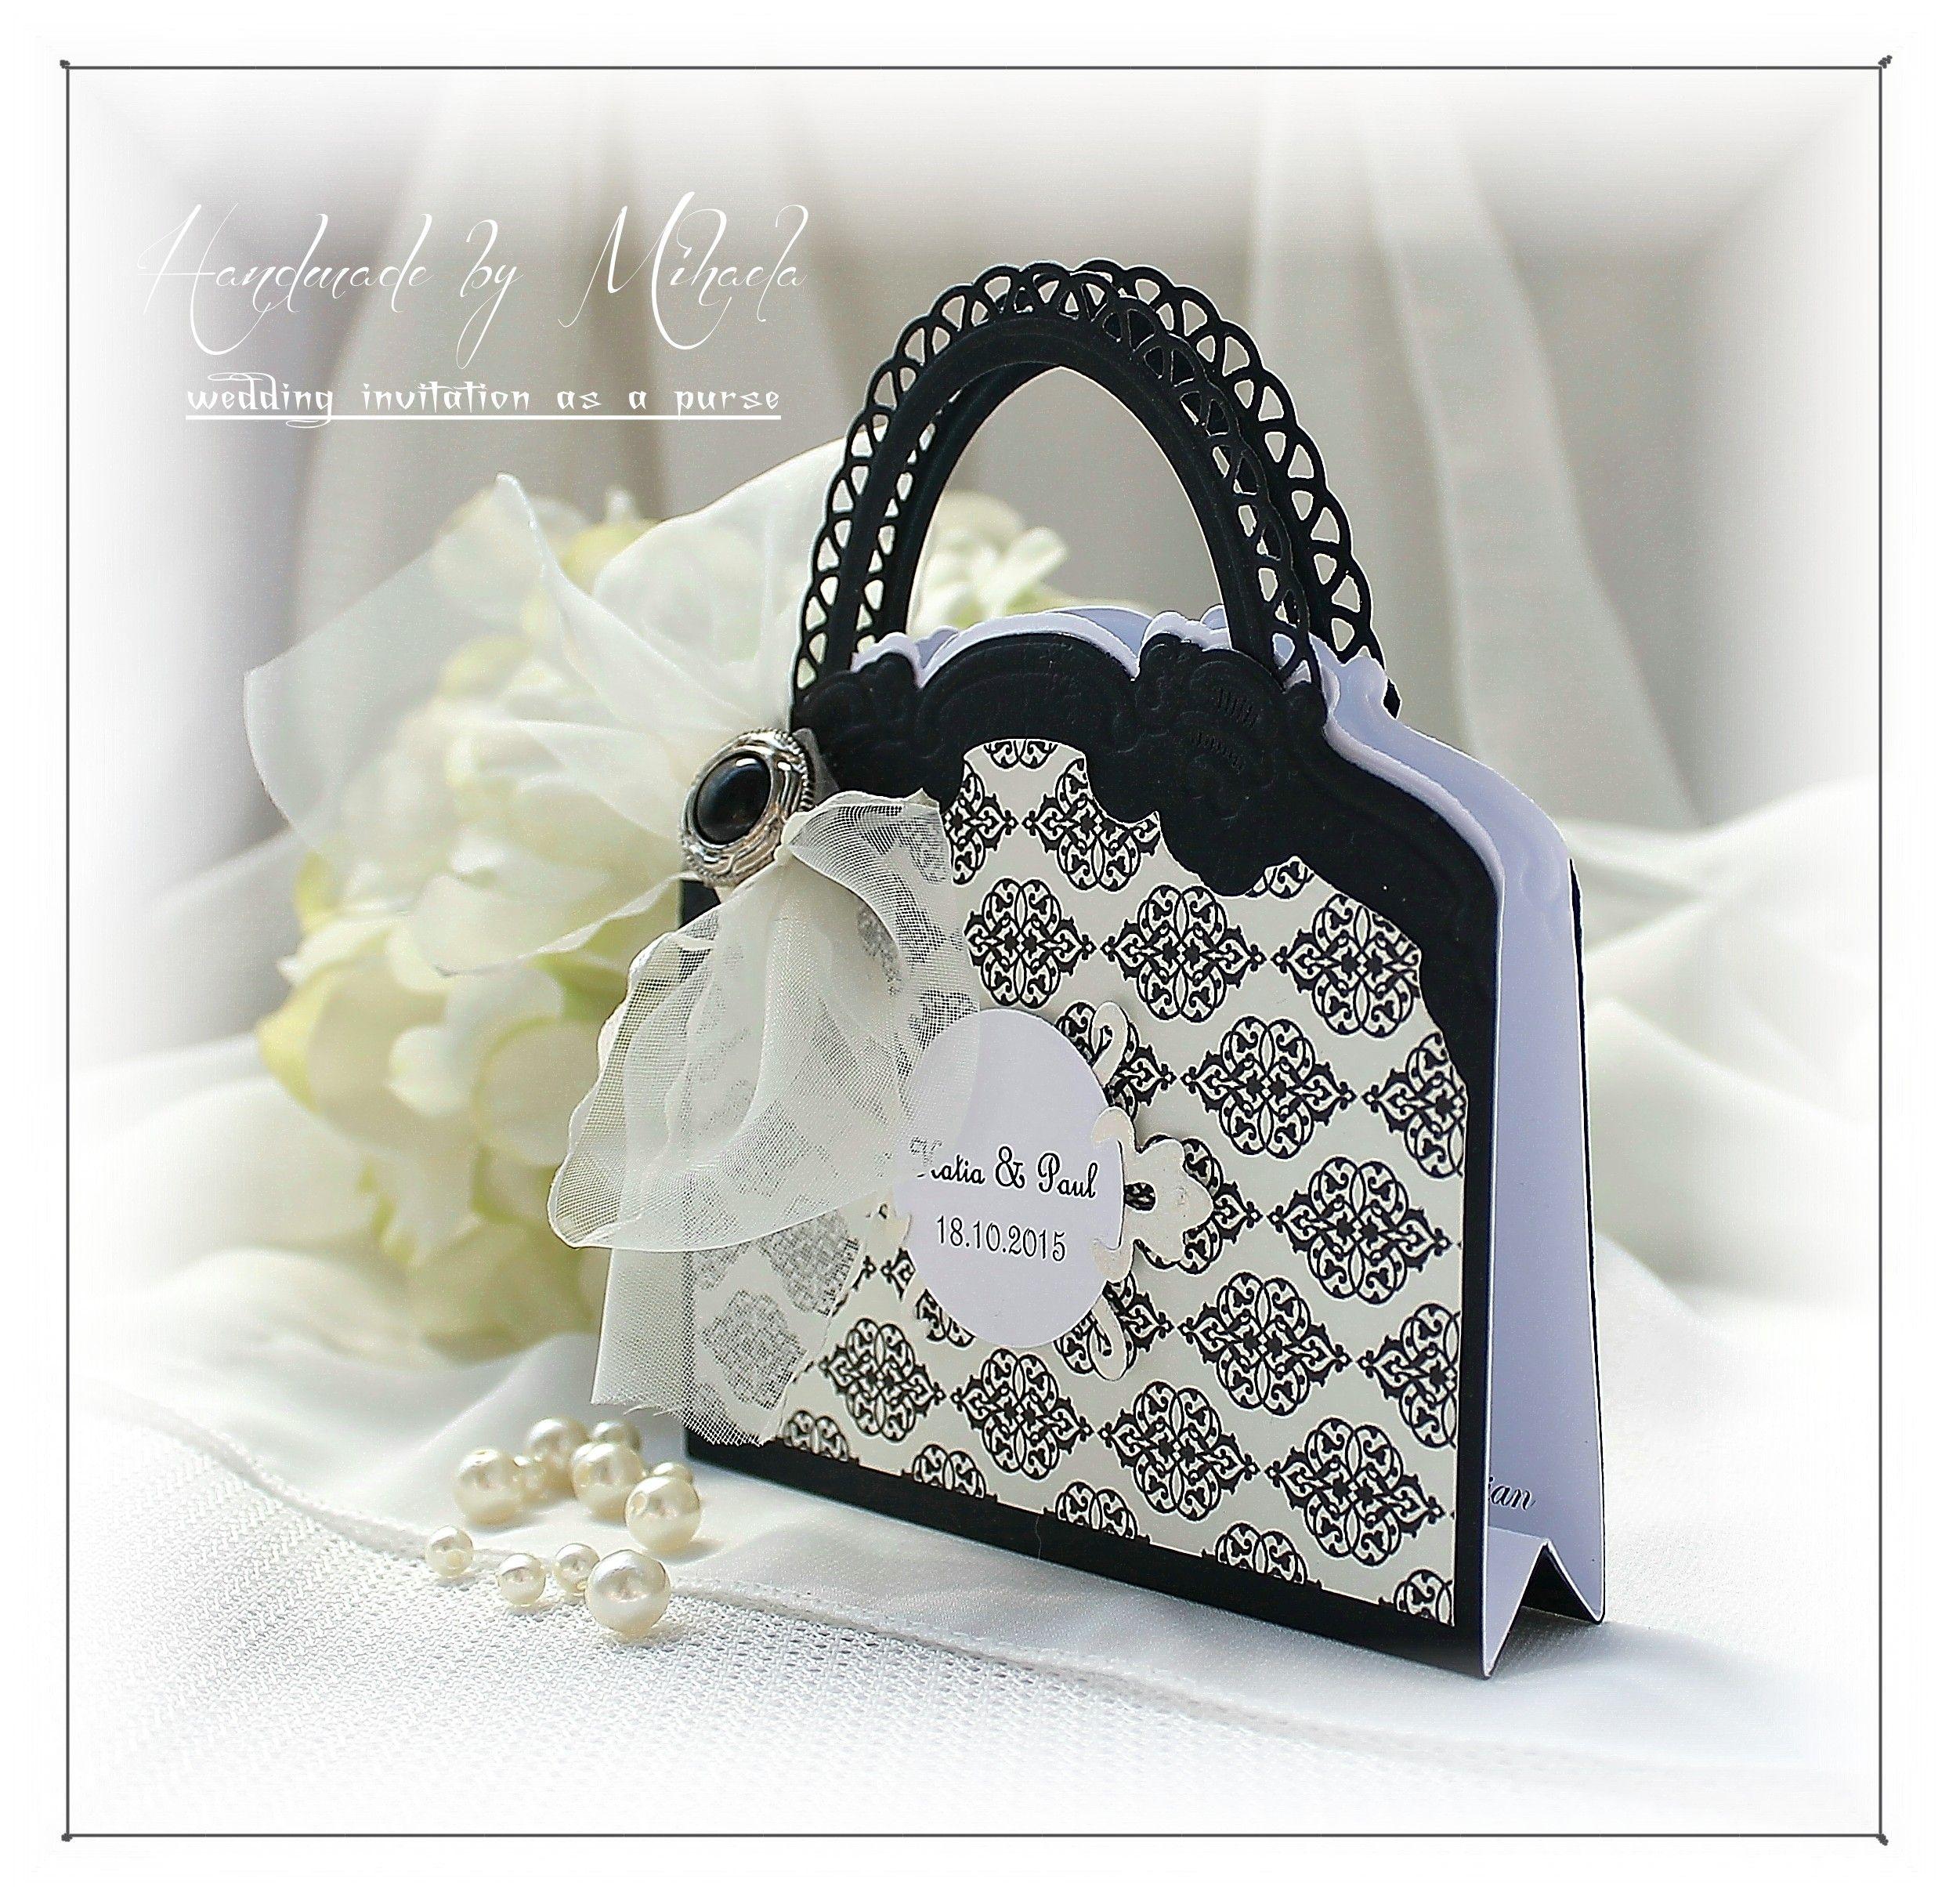 Wedding invitation as a purse | Wedding invitations and decorations ...